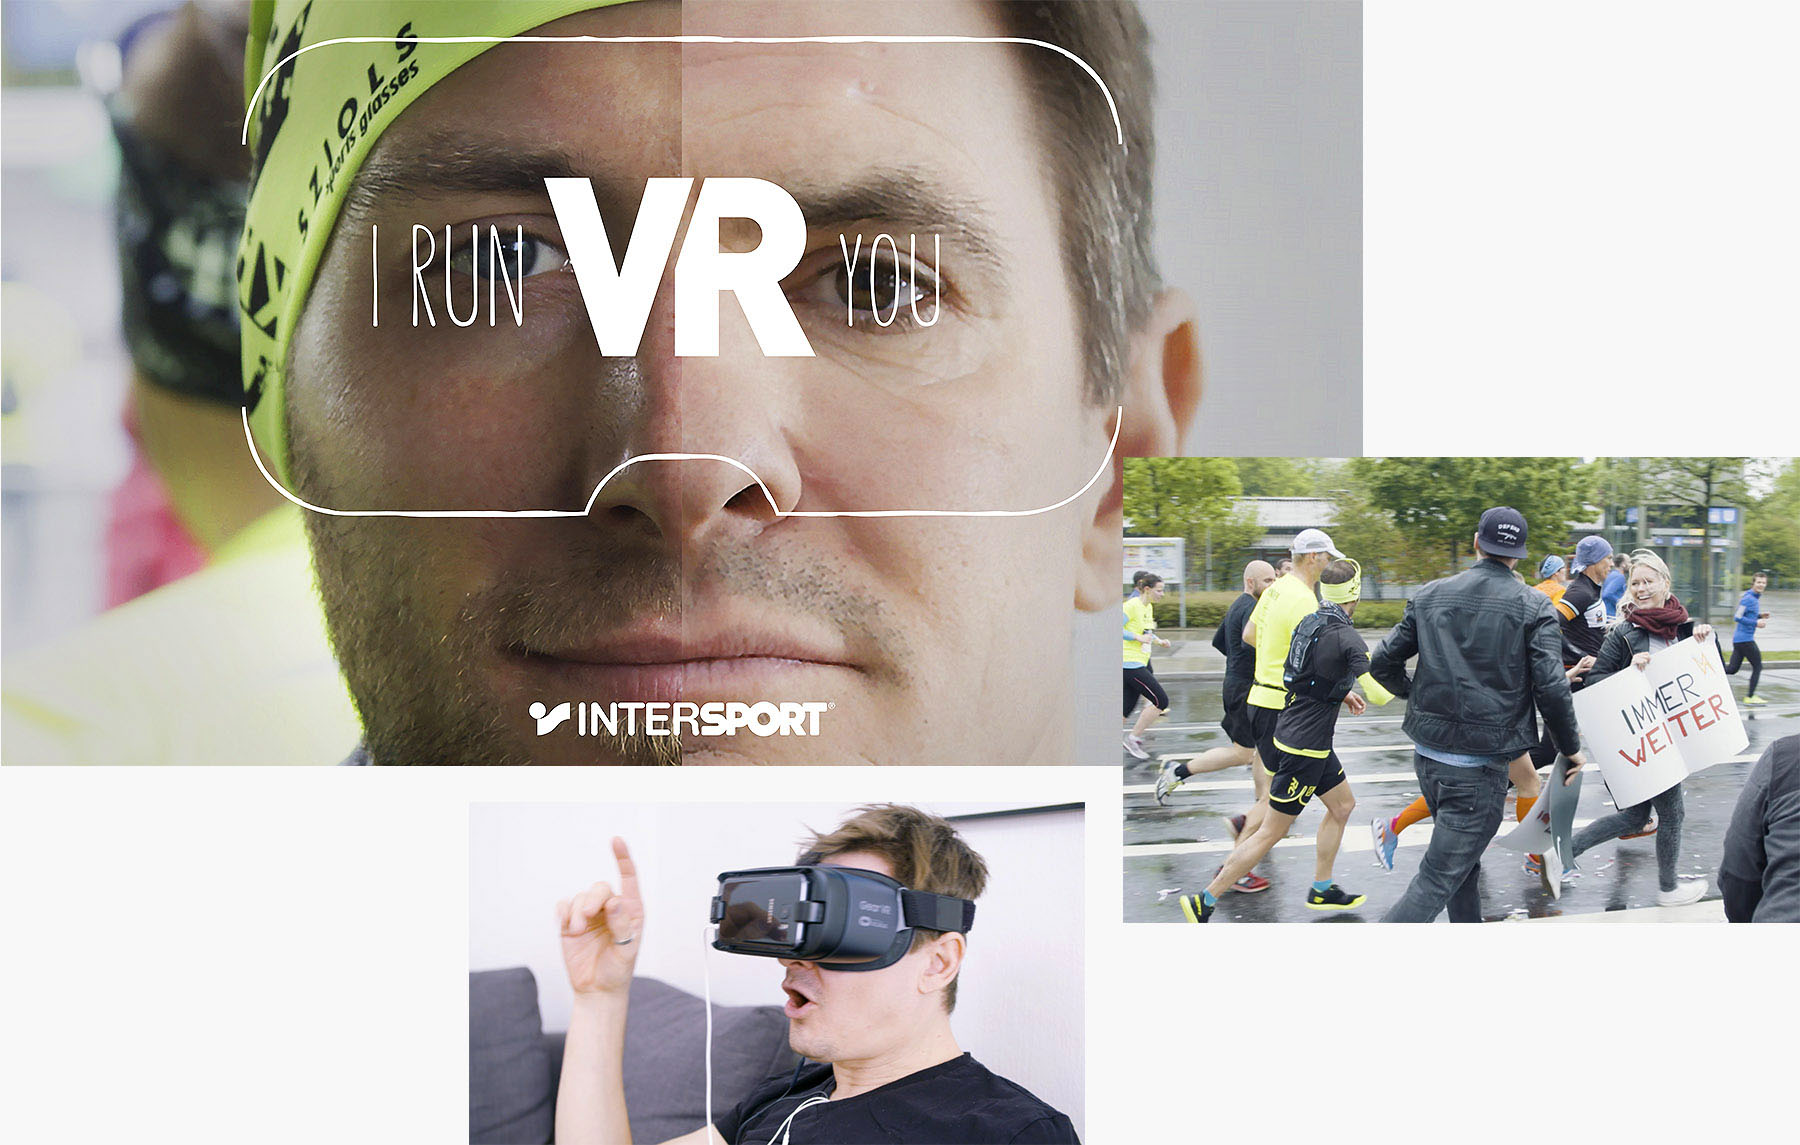 I run VR you